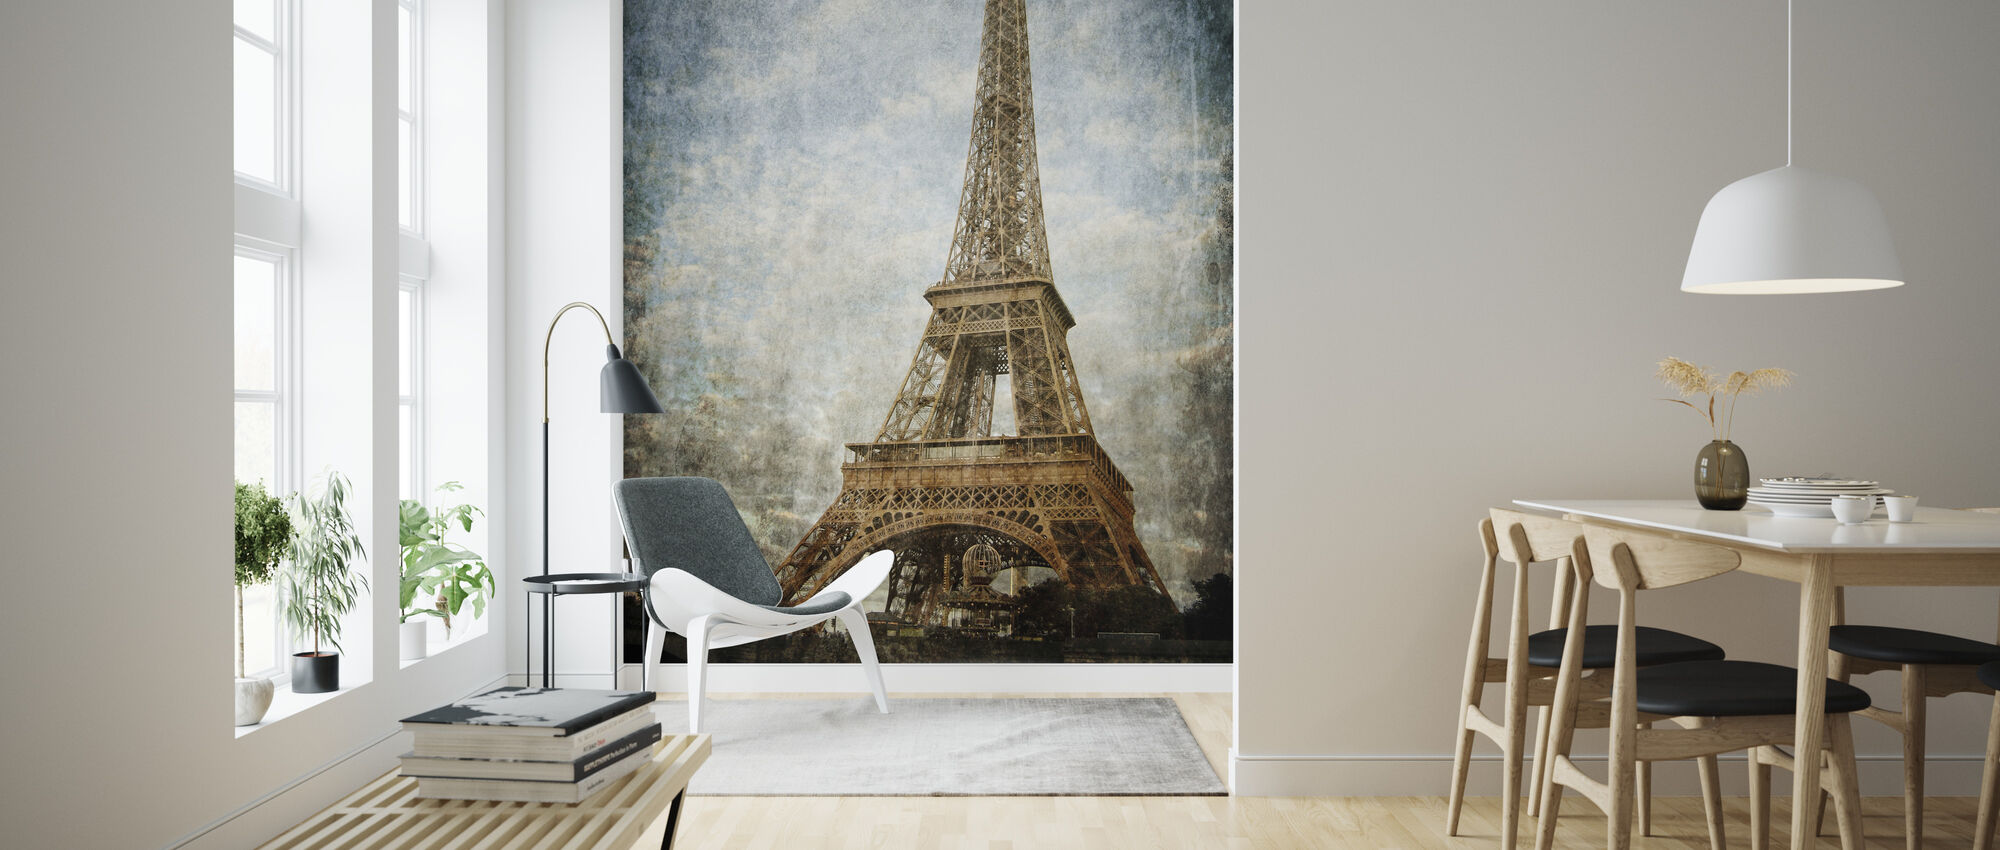 Vintage Eiffel Tower - Wallpaper - Living Room